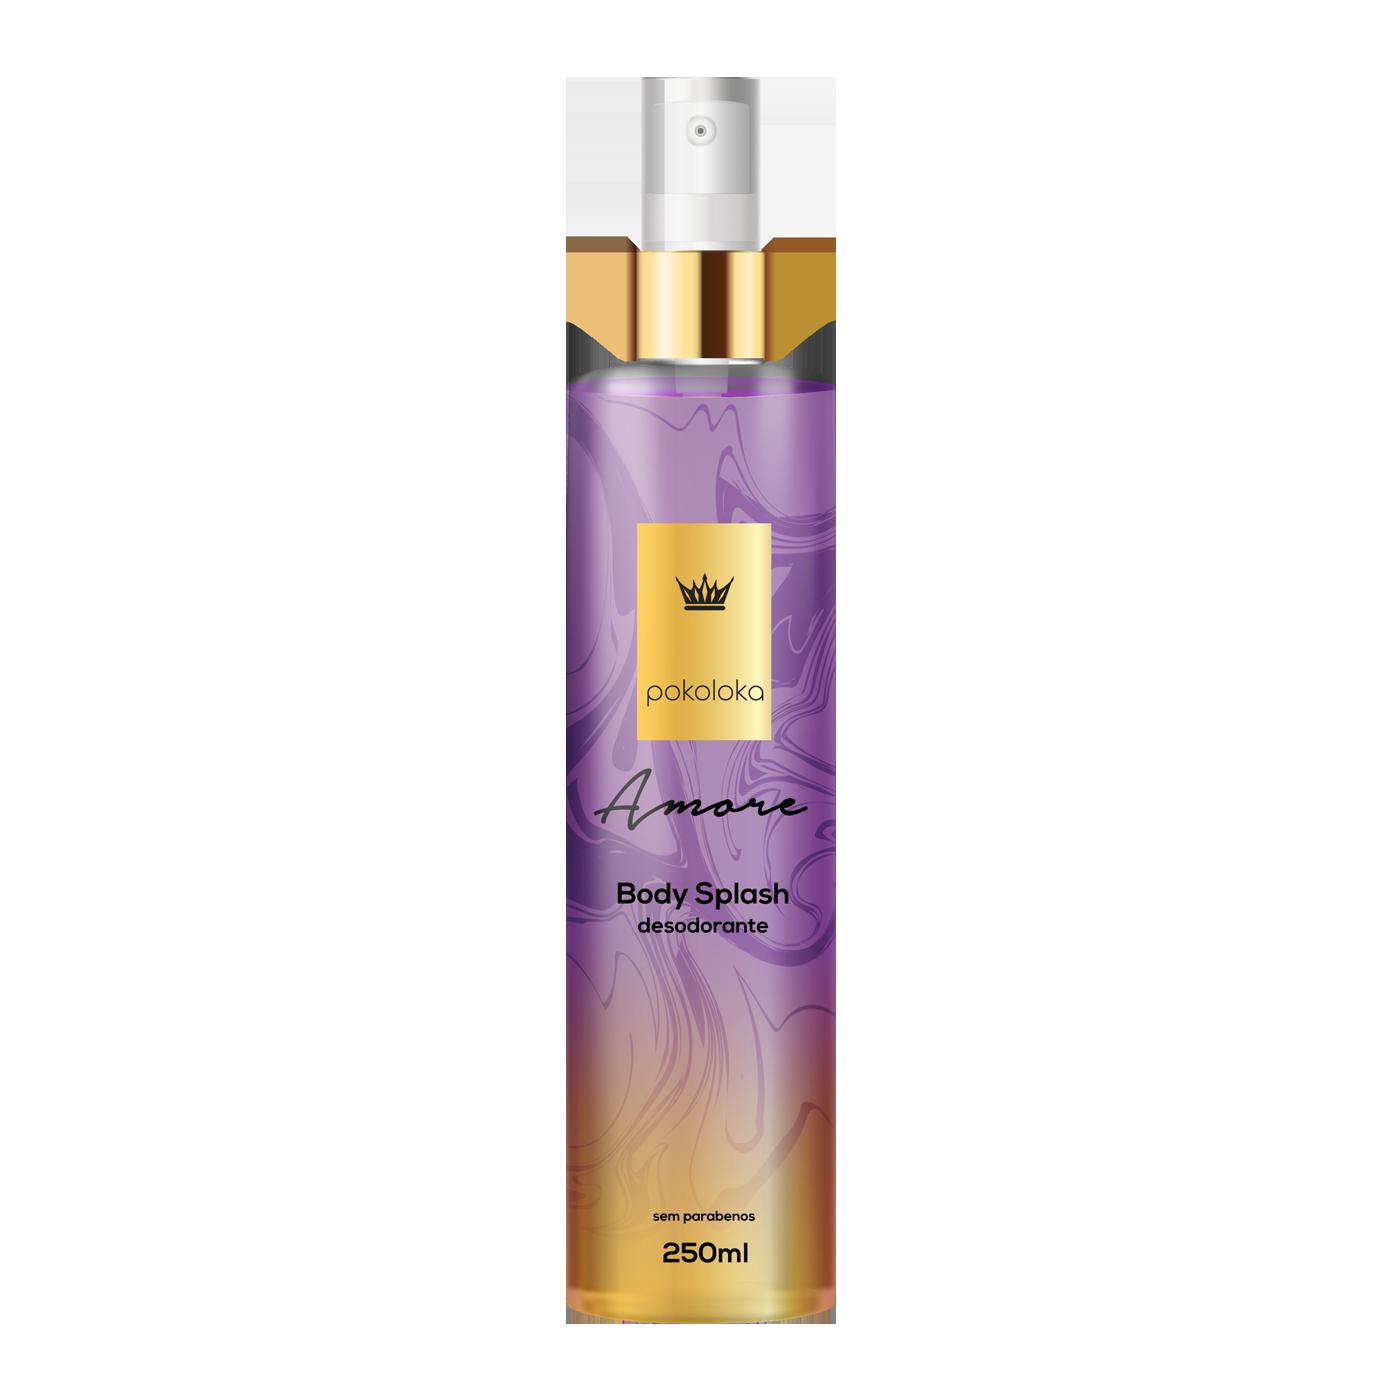 Body Splash Perfumado Amore Pokaloka 250ml